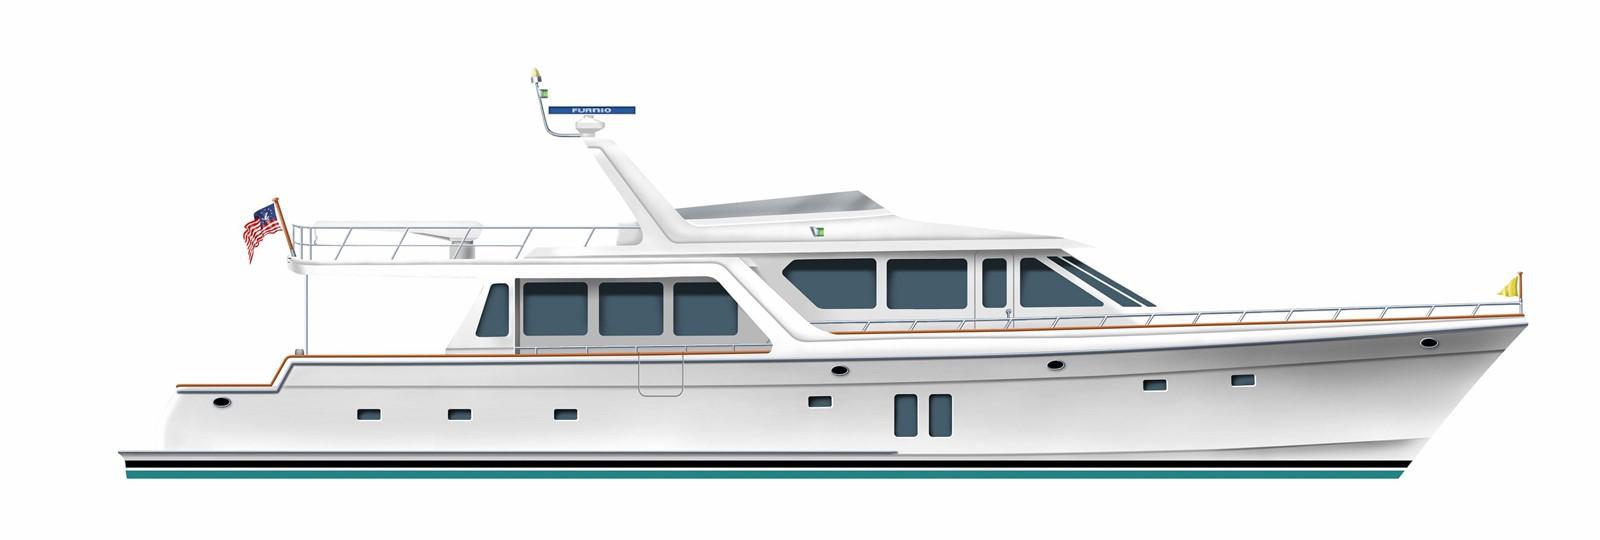 2020 OFFSHORE YACHTS 76/80 Motoryacht Motor Yacht 2571165